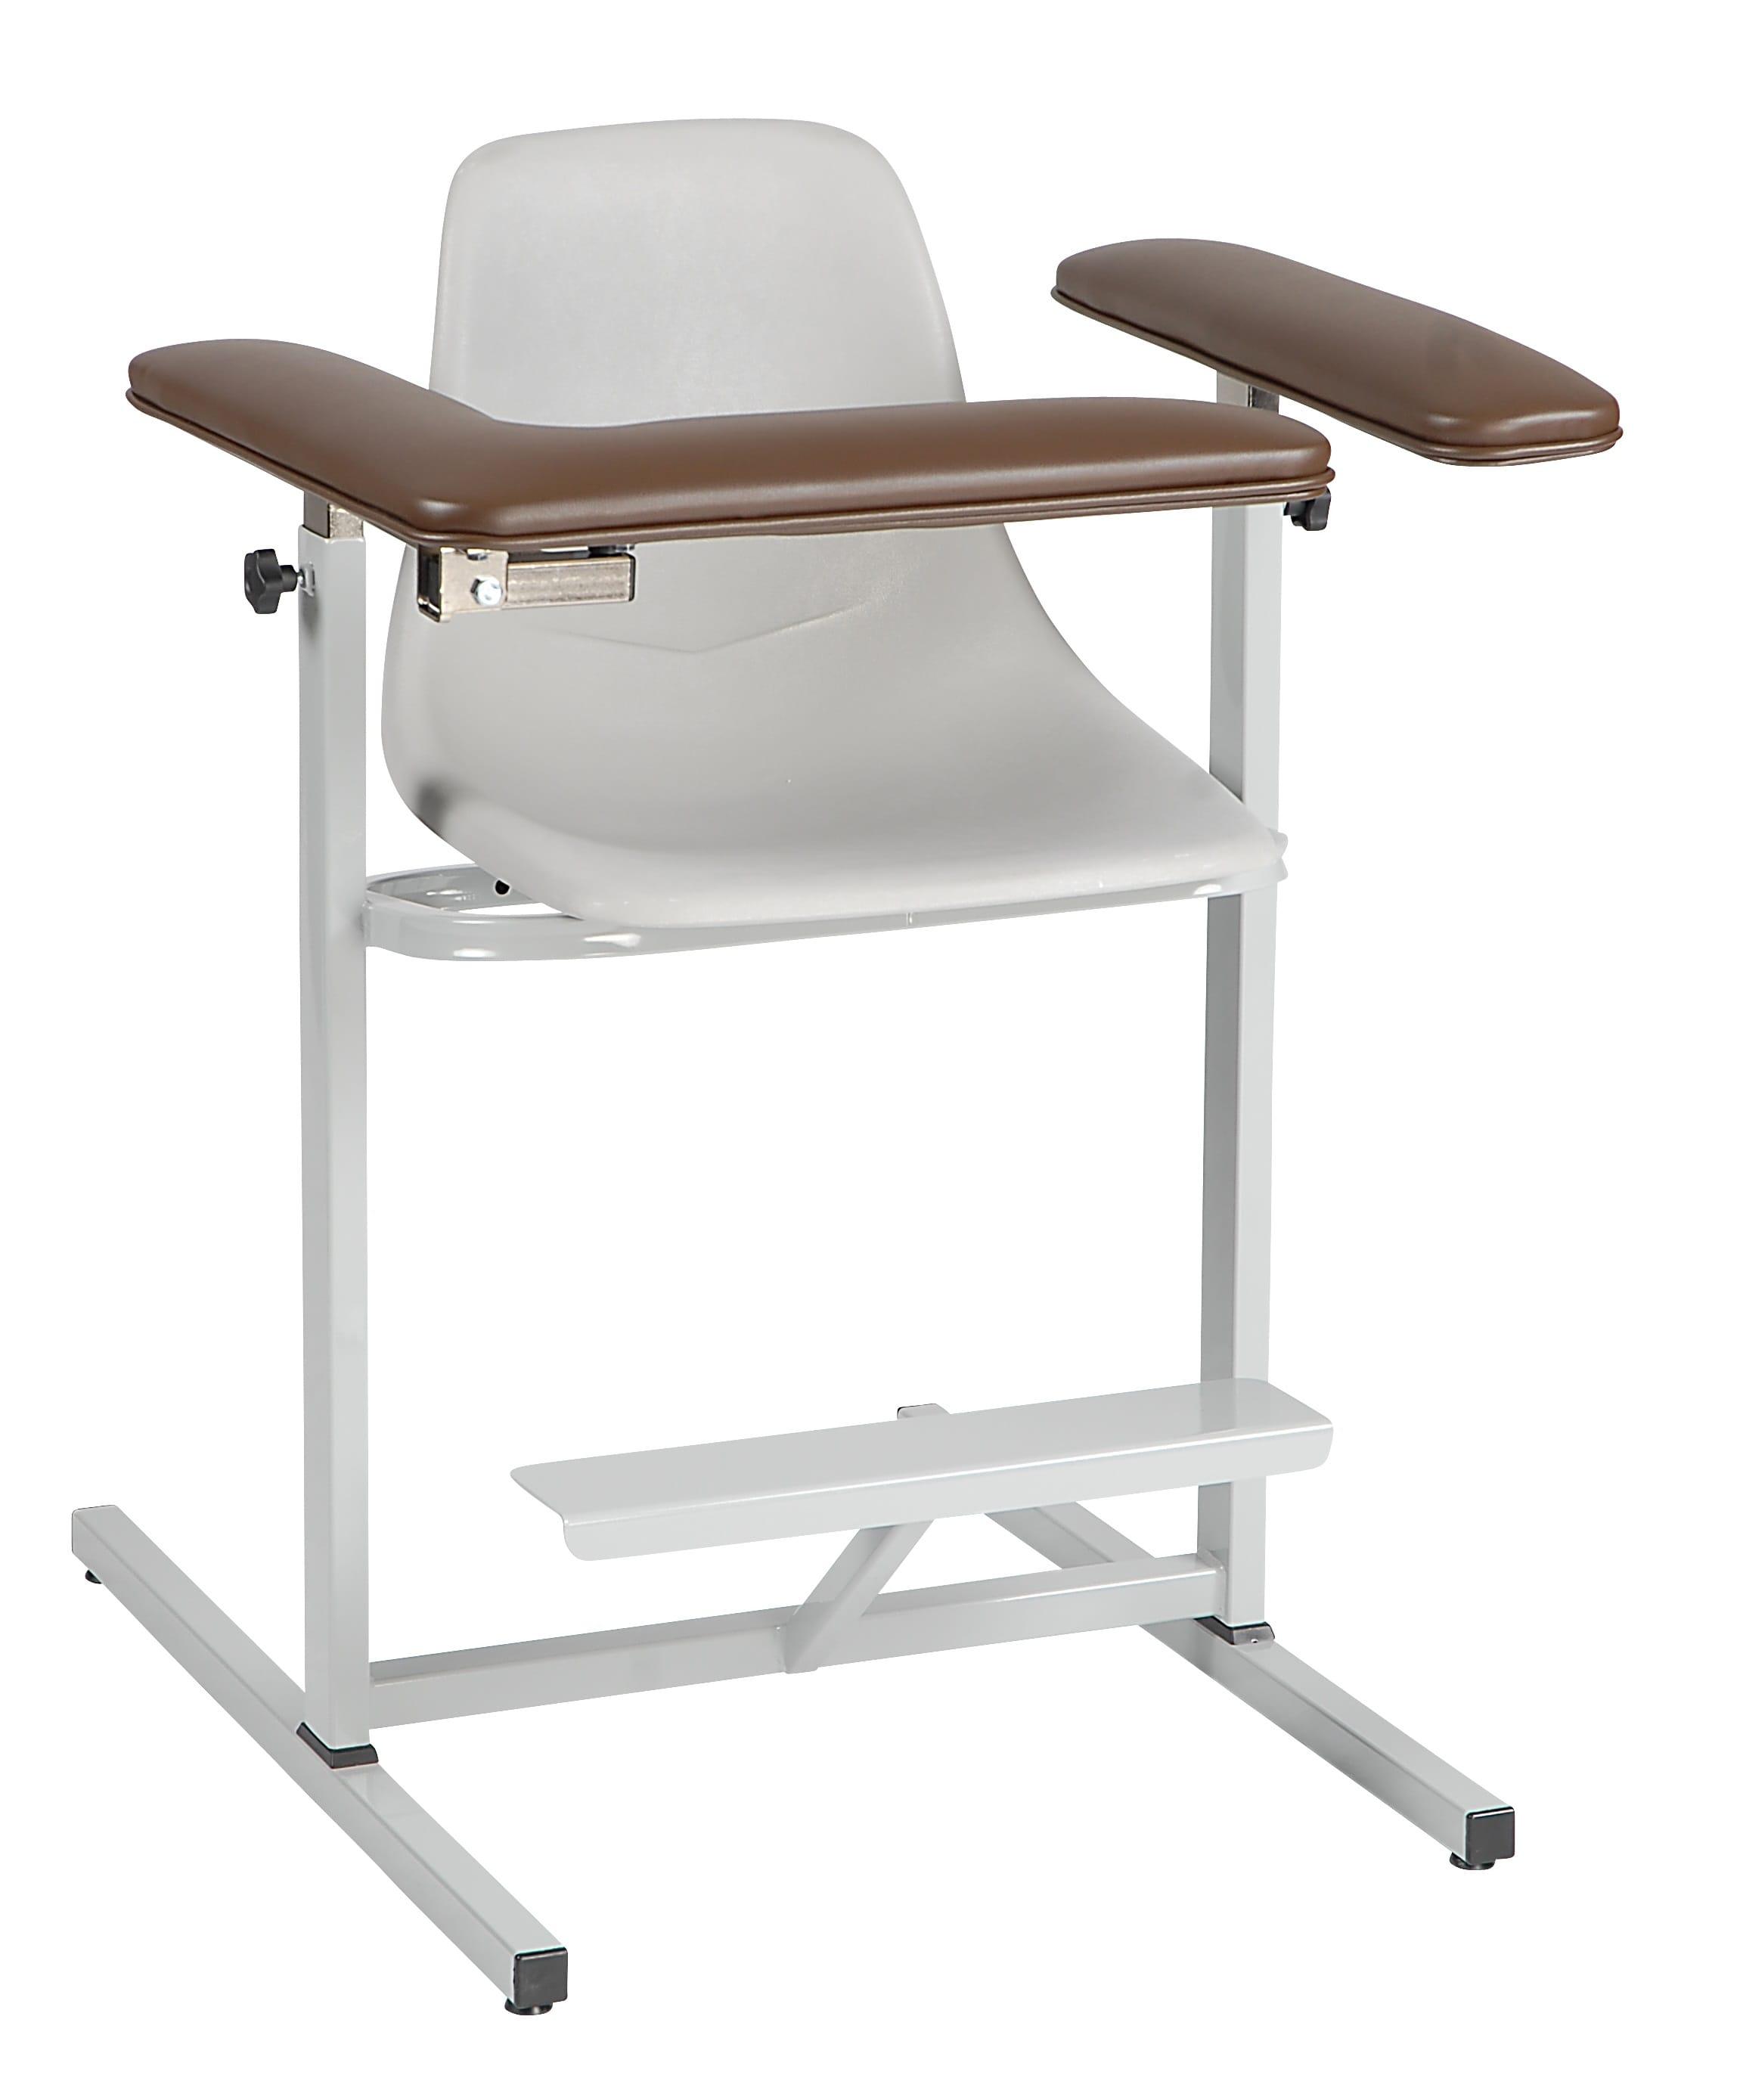 blood draw chair round wicker uk narrow tall height 1202 lxt n